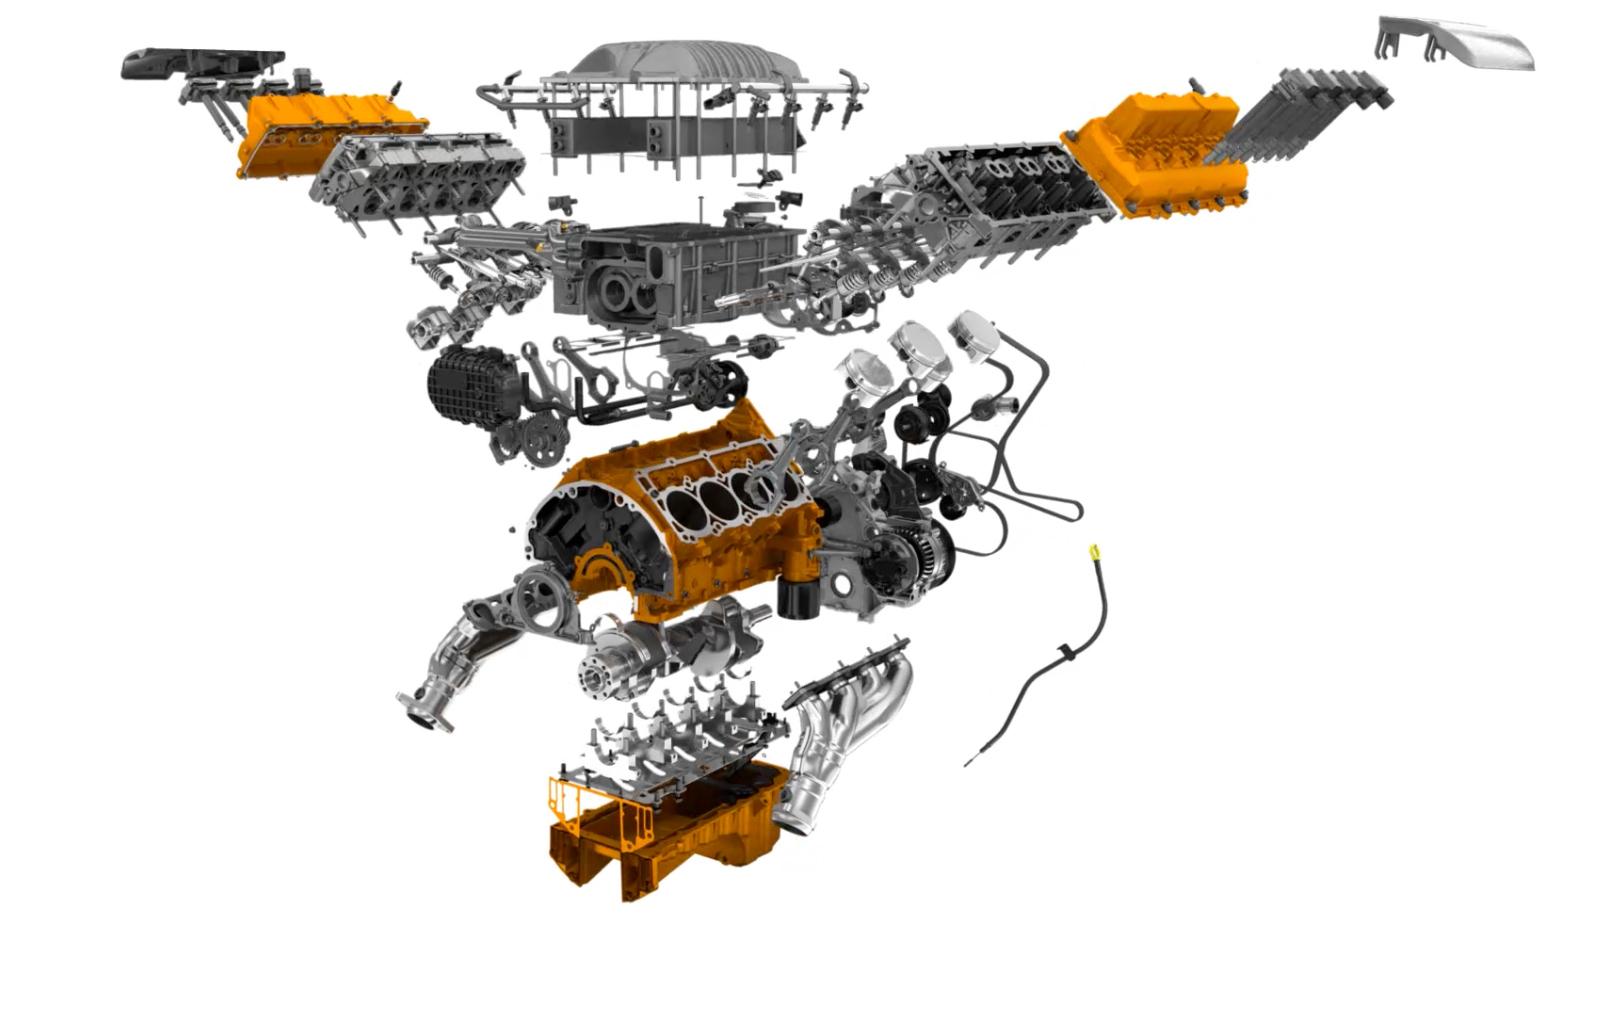 hight resolution of chrysler lets us peek under the hood of 2015 alfa romeo chrysler dodge jeep models